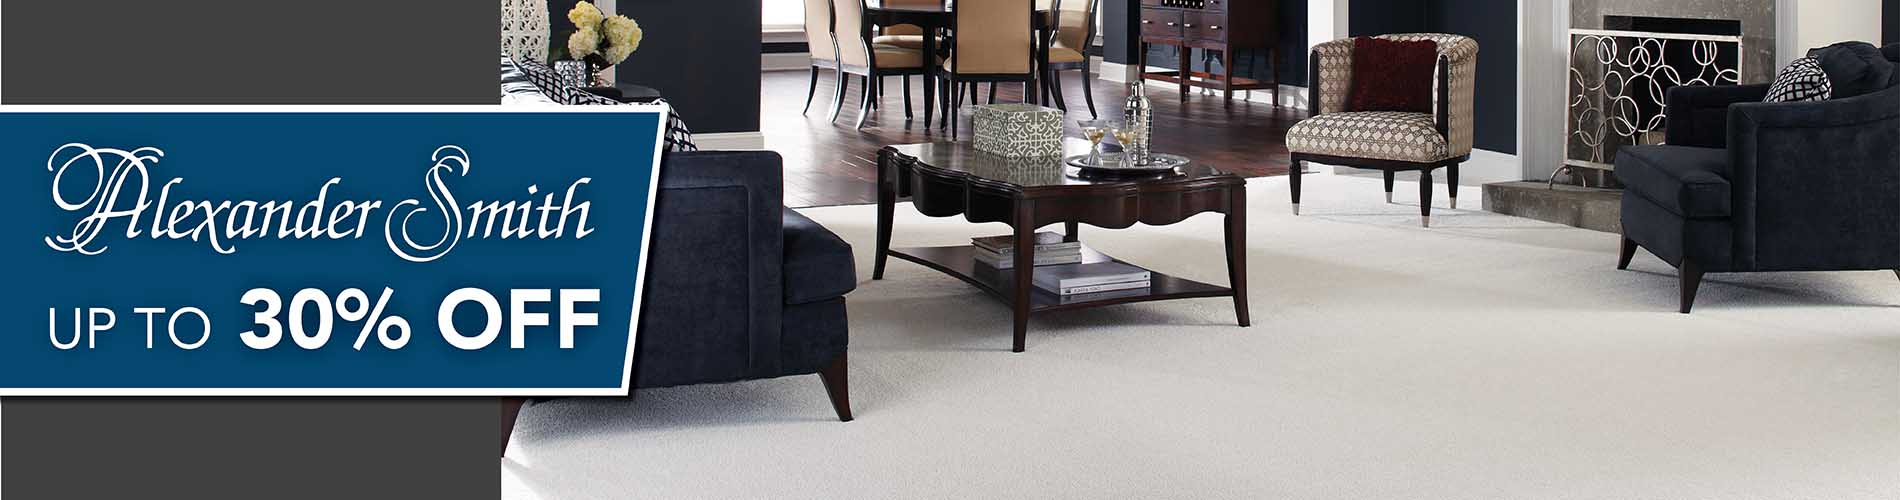 Alexander Smith sale 30% off at Flooring USA Kitchen and Bath Design Center